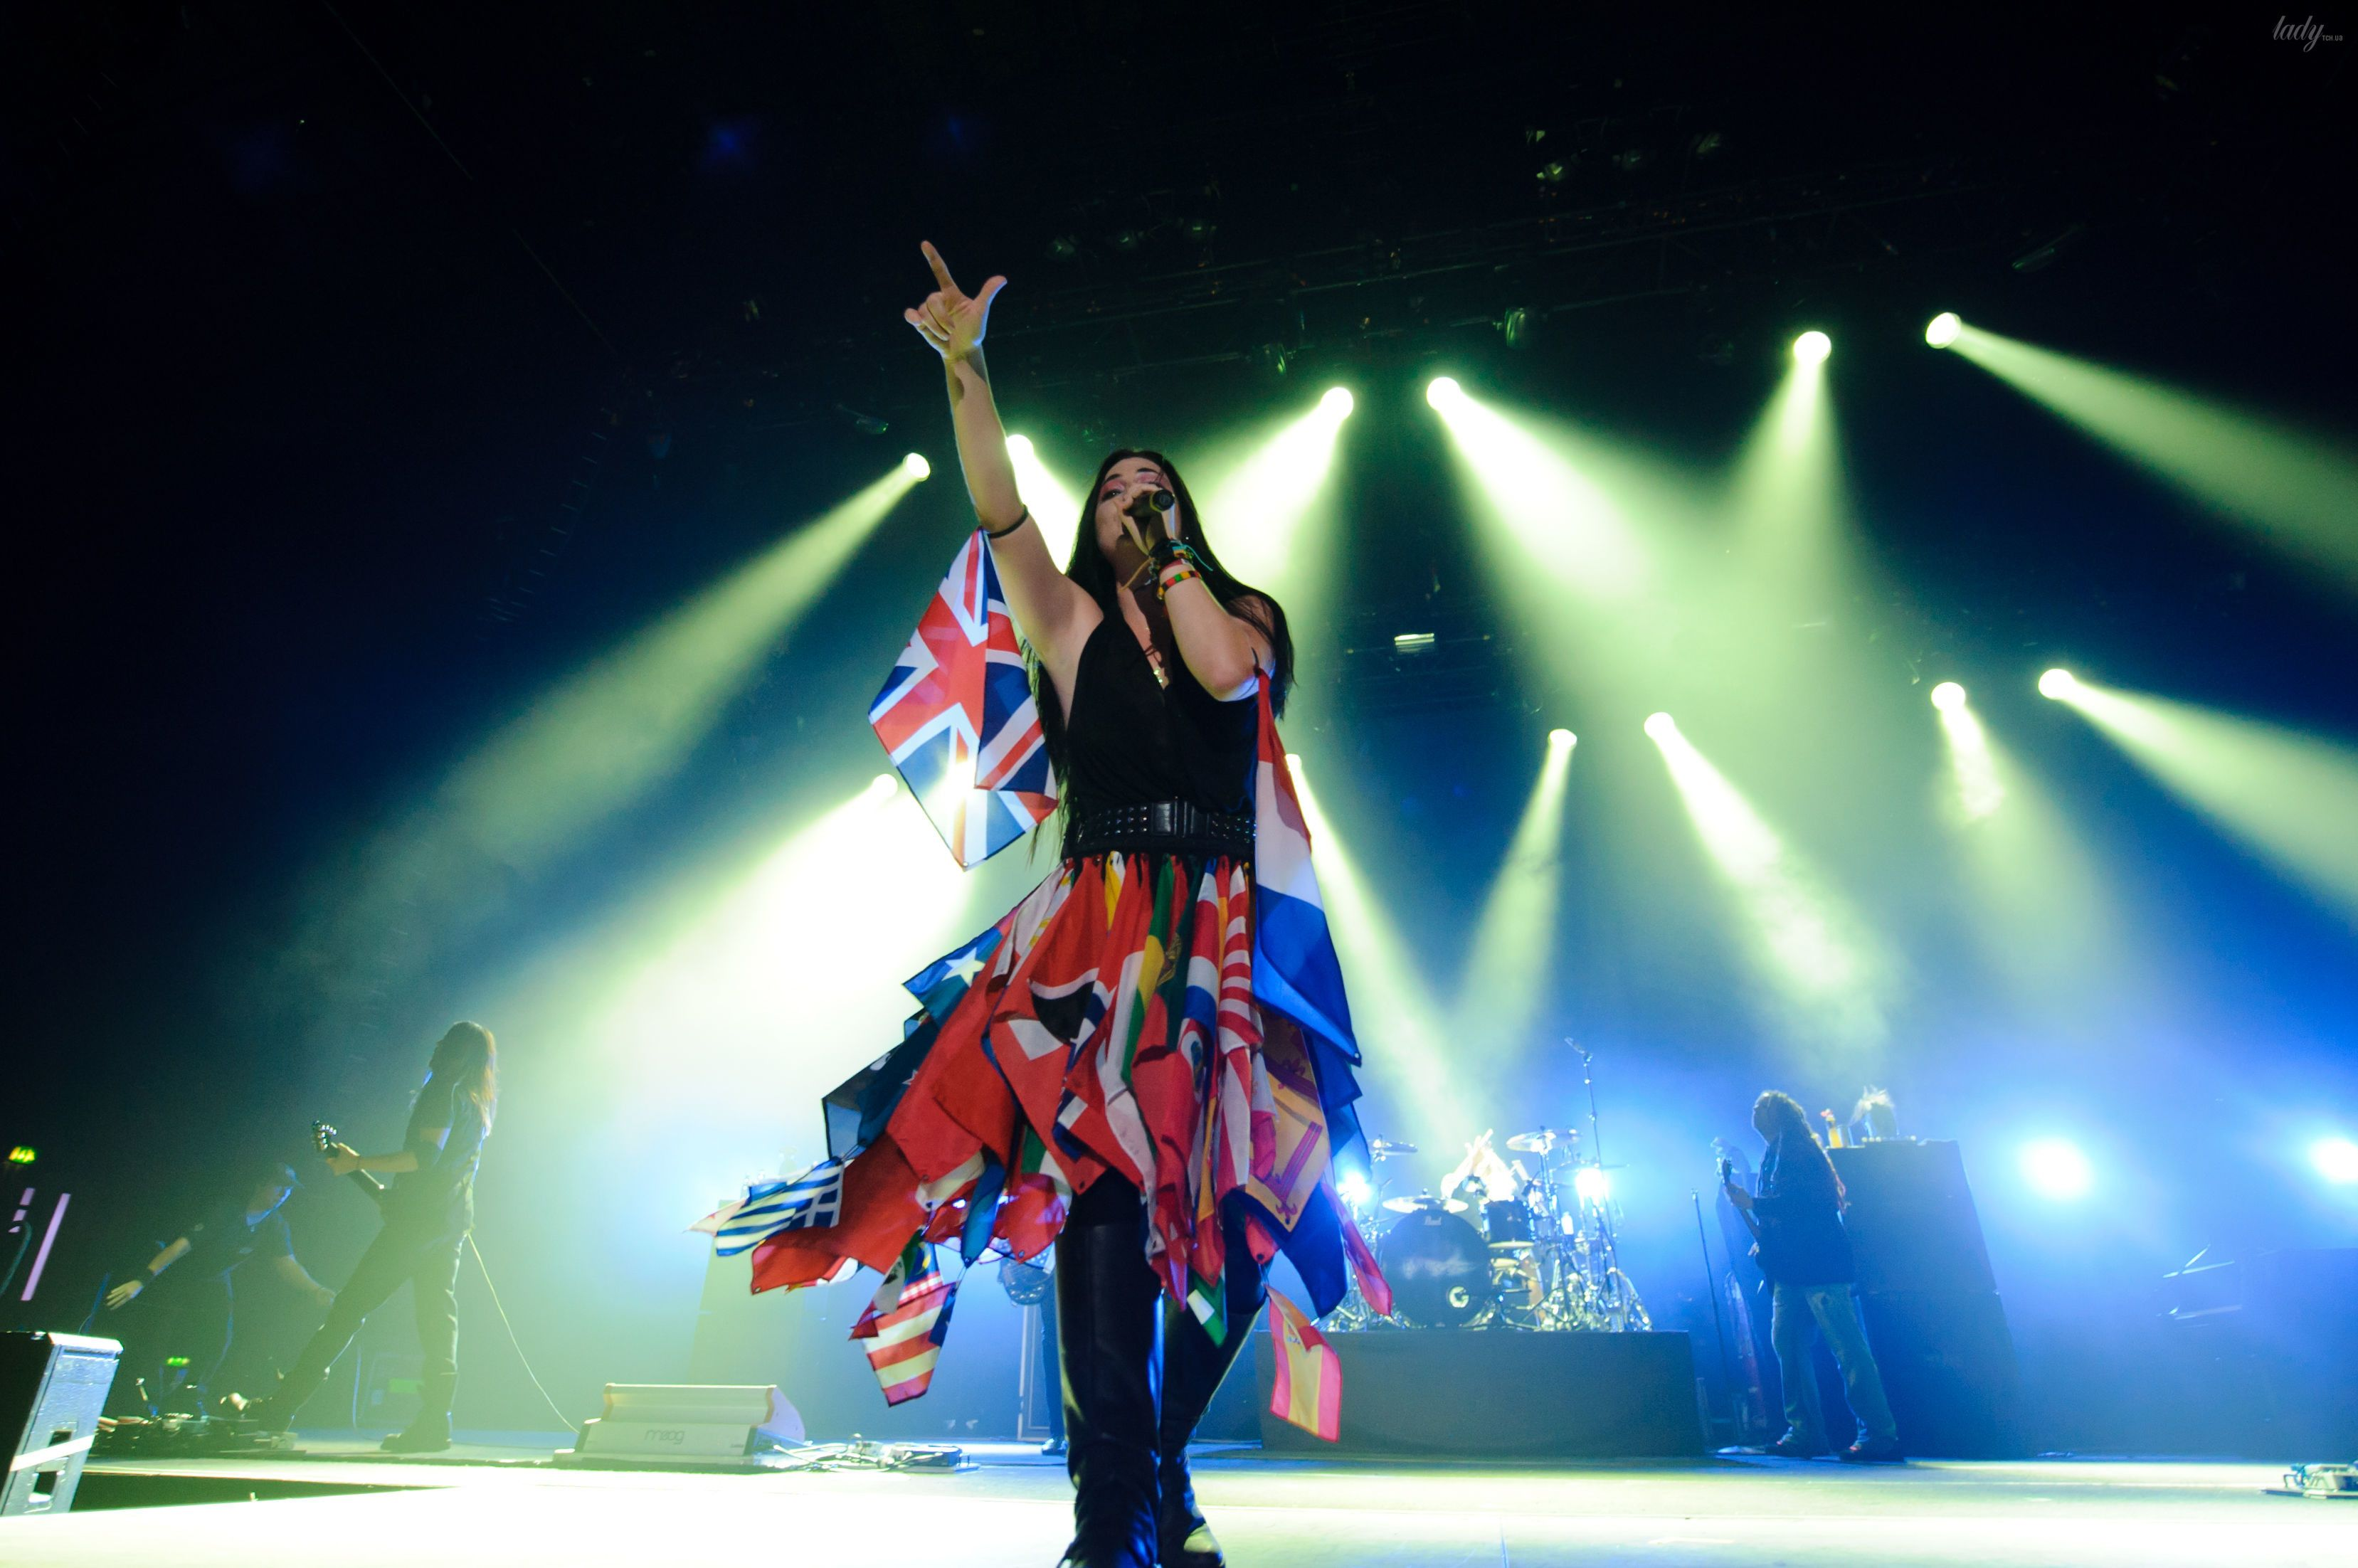 Солистка группы Evanescence Эми Ли_6